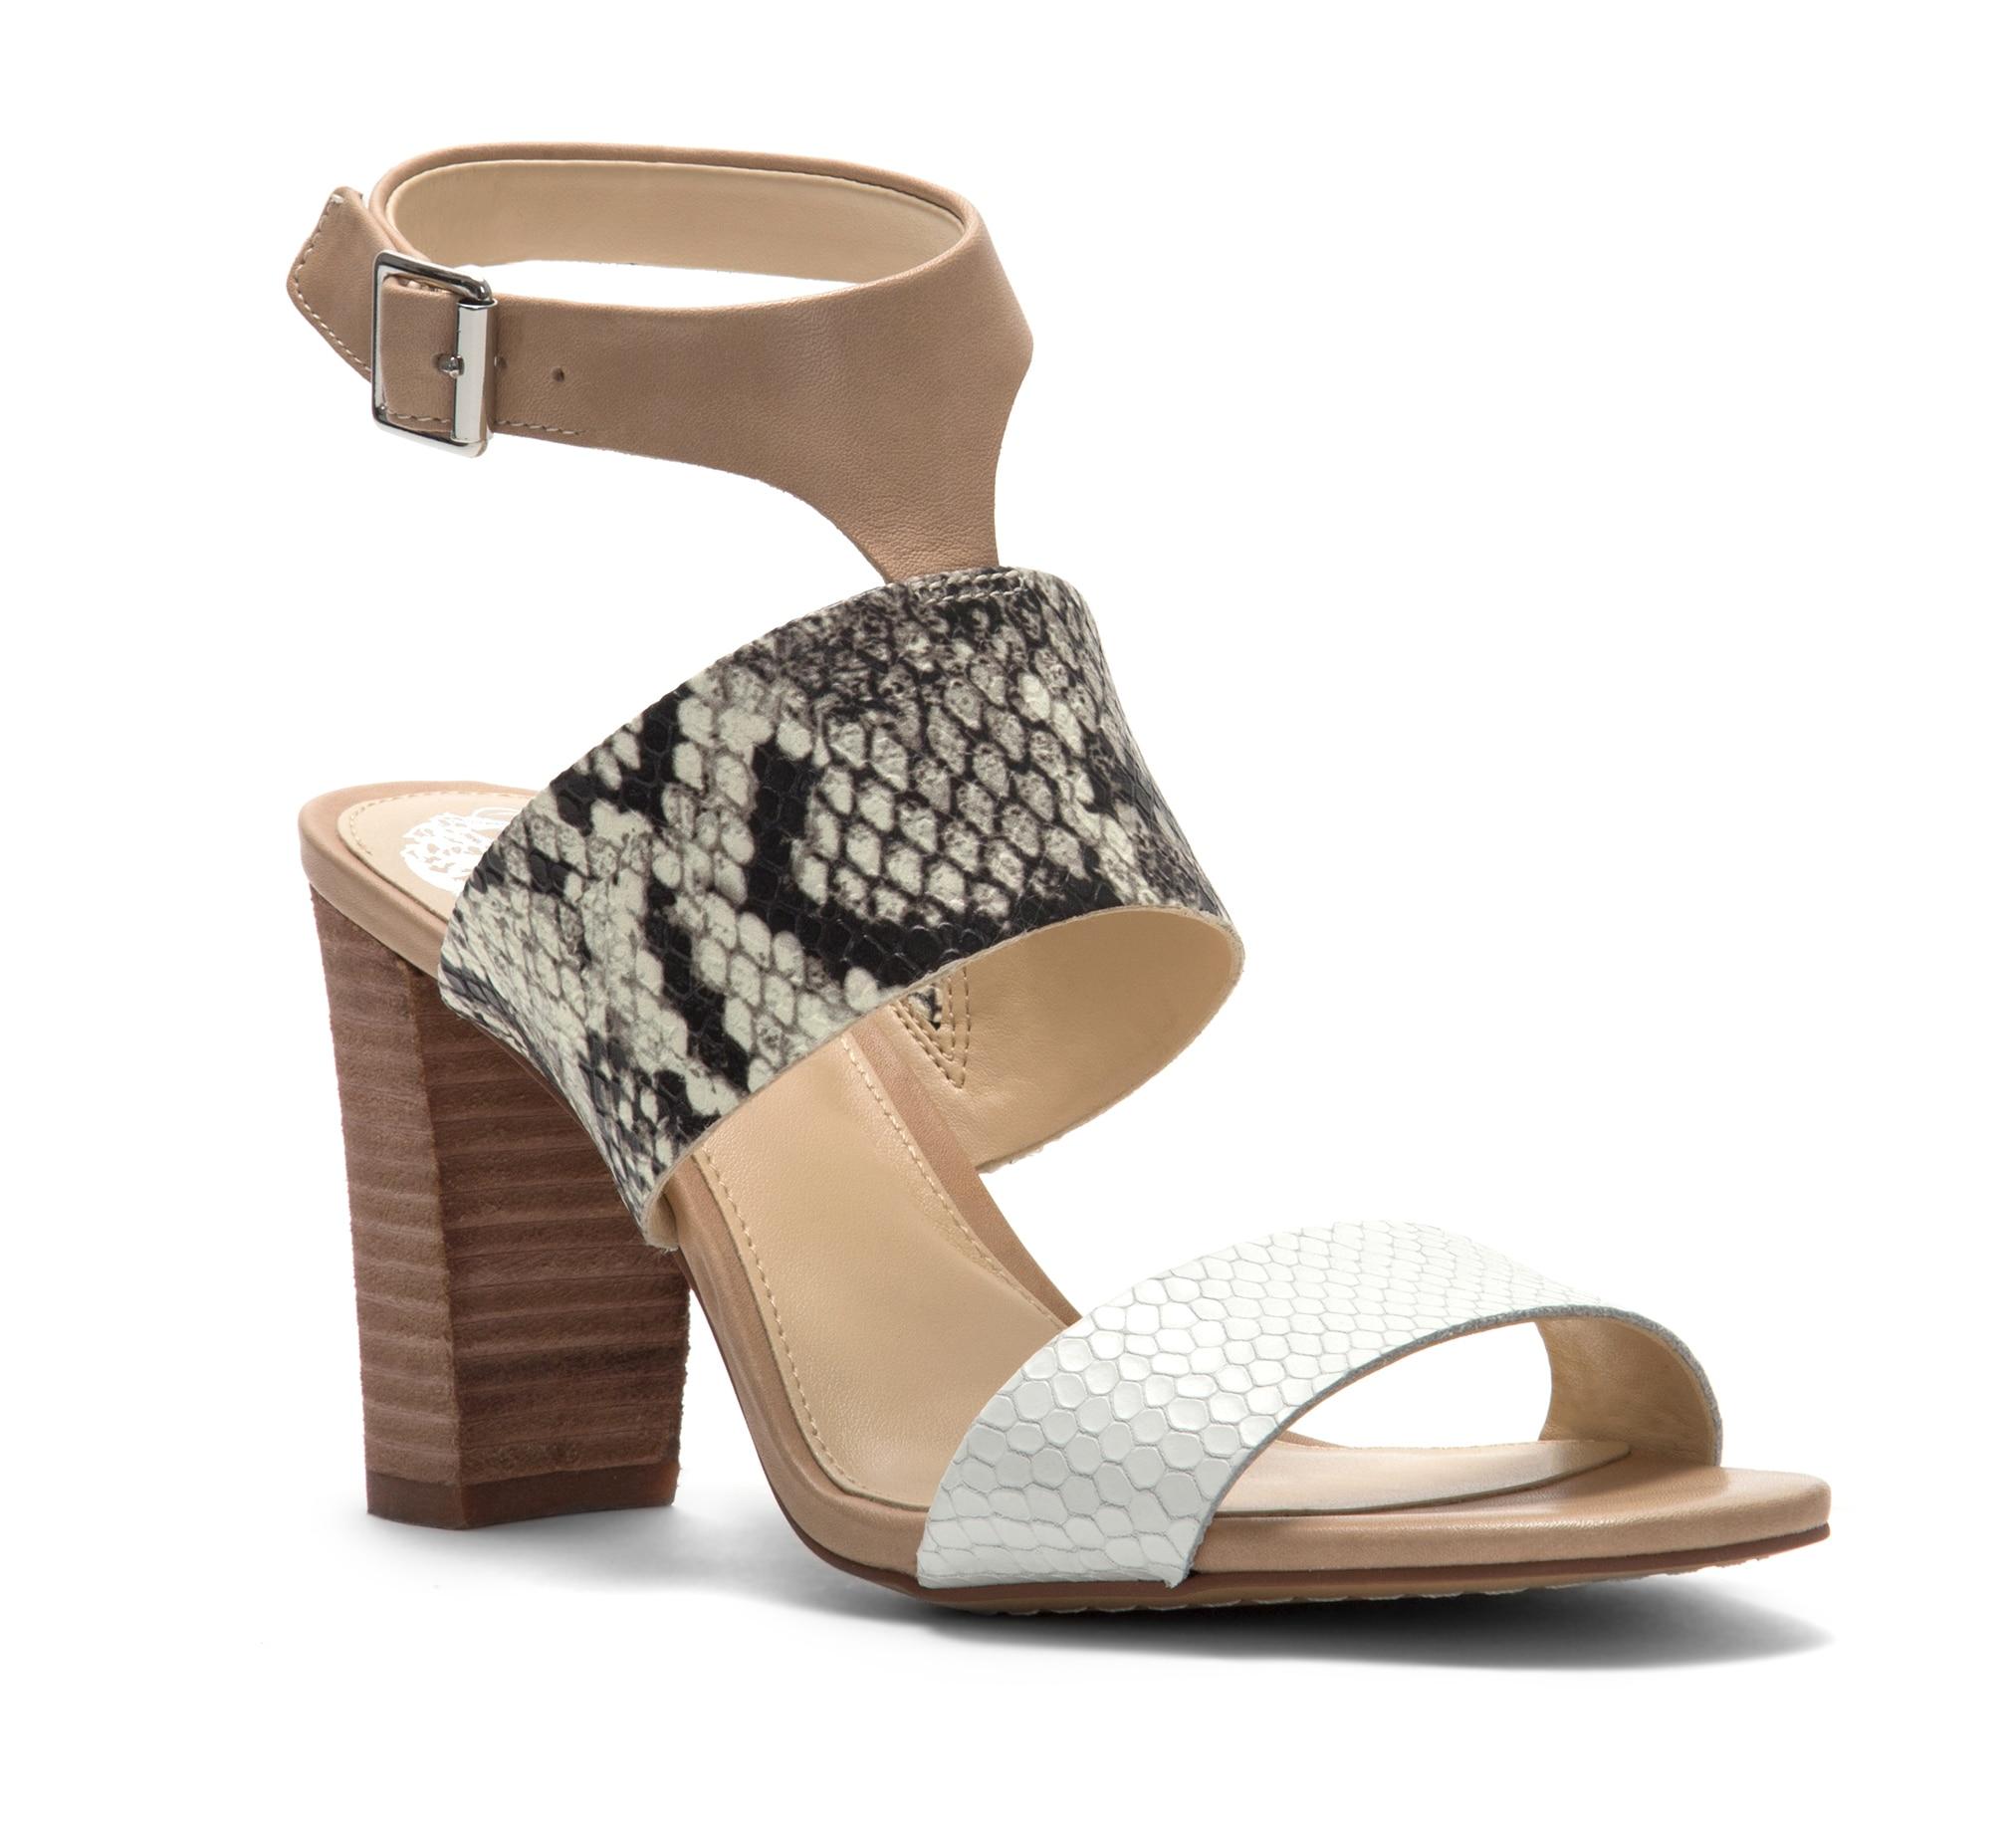 Cristina Sabatini Shoesamp; Handbags Women's Sandals 0wyOvN8nm